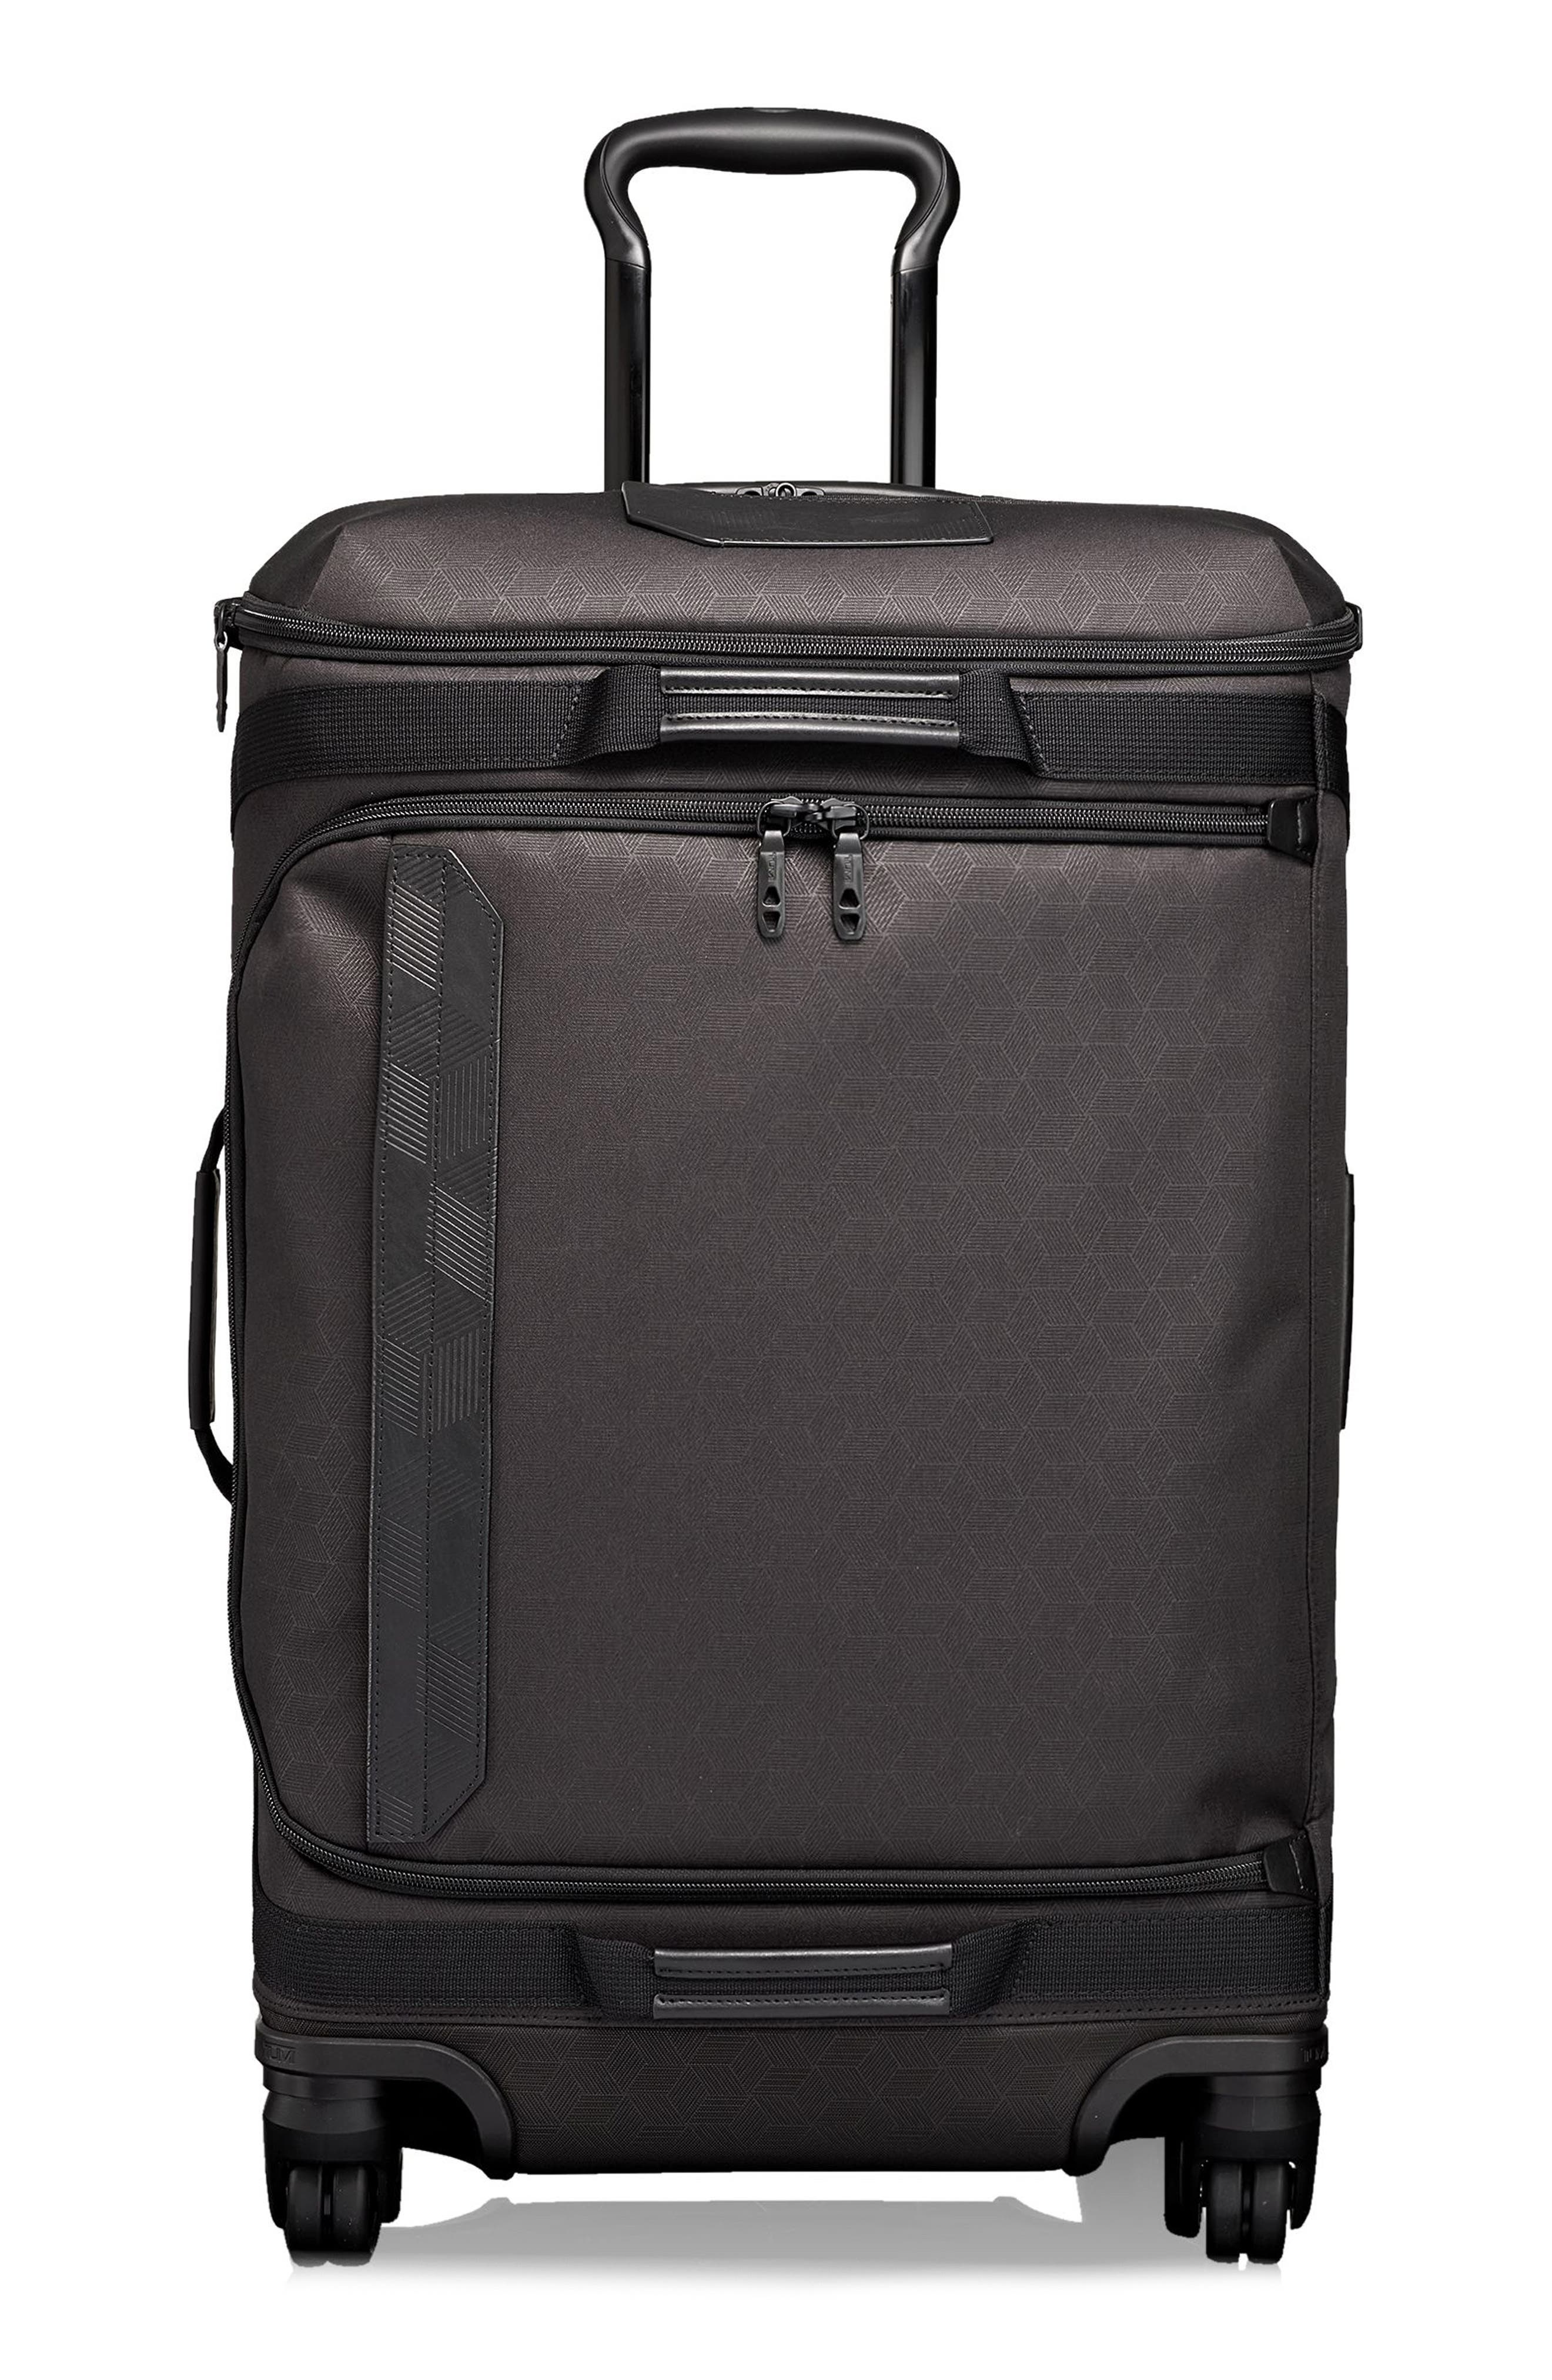 Tumi Reno Tahoe Short Trip Expandable 26-Inch Suitcase